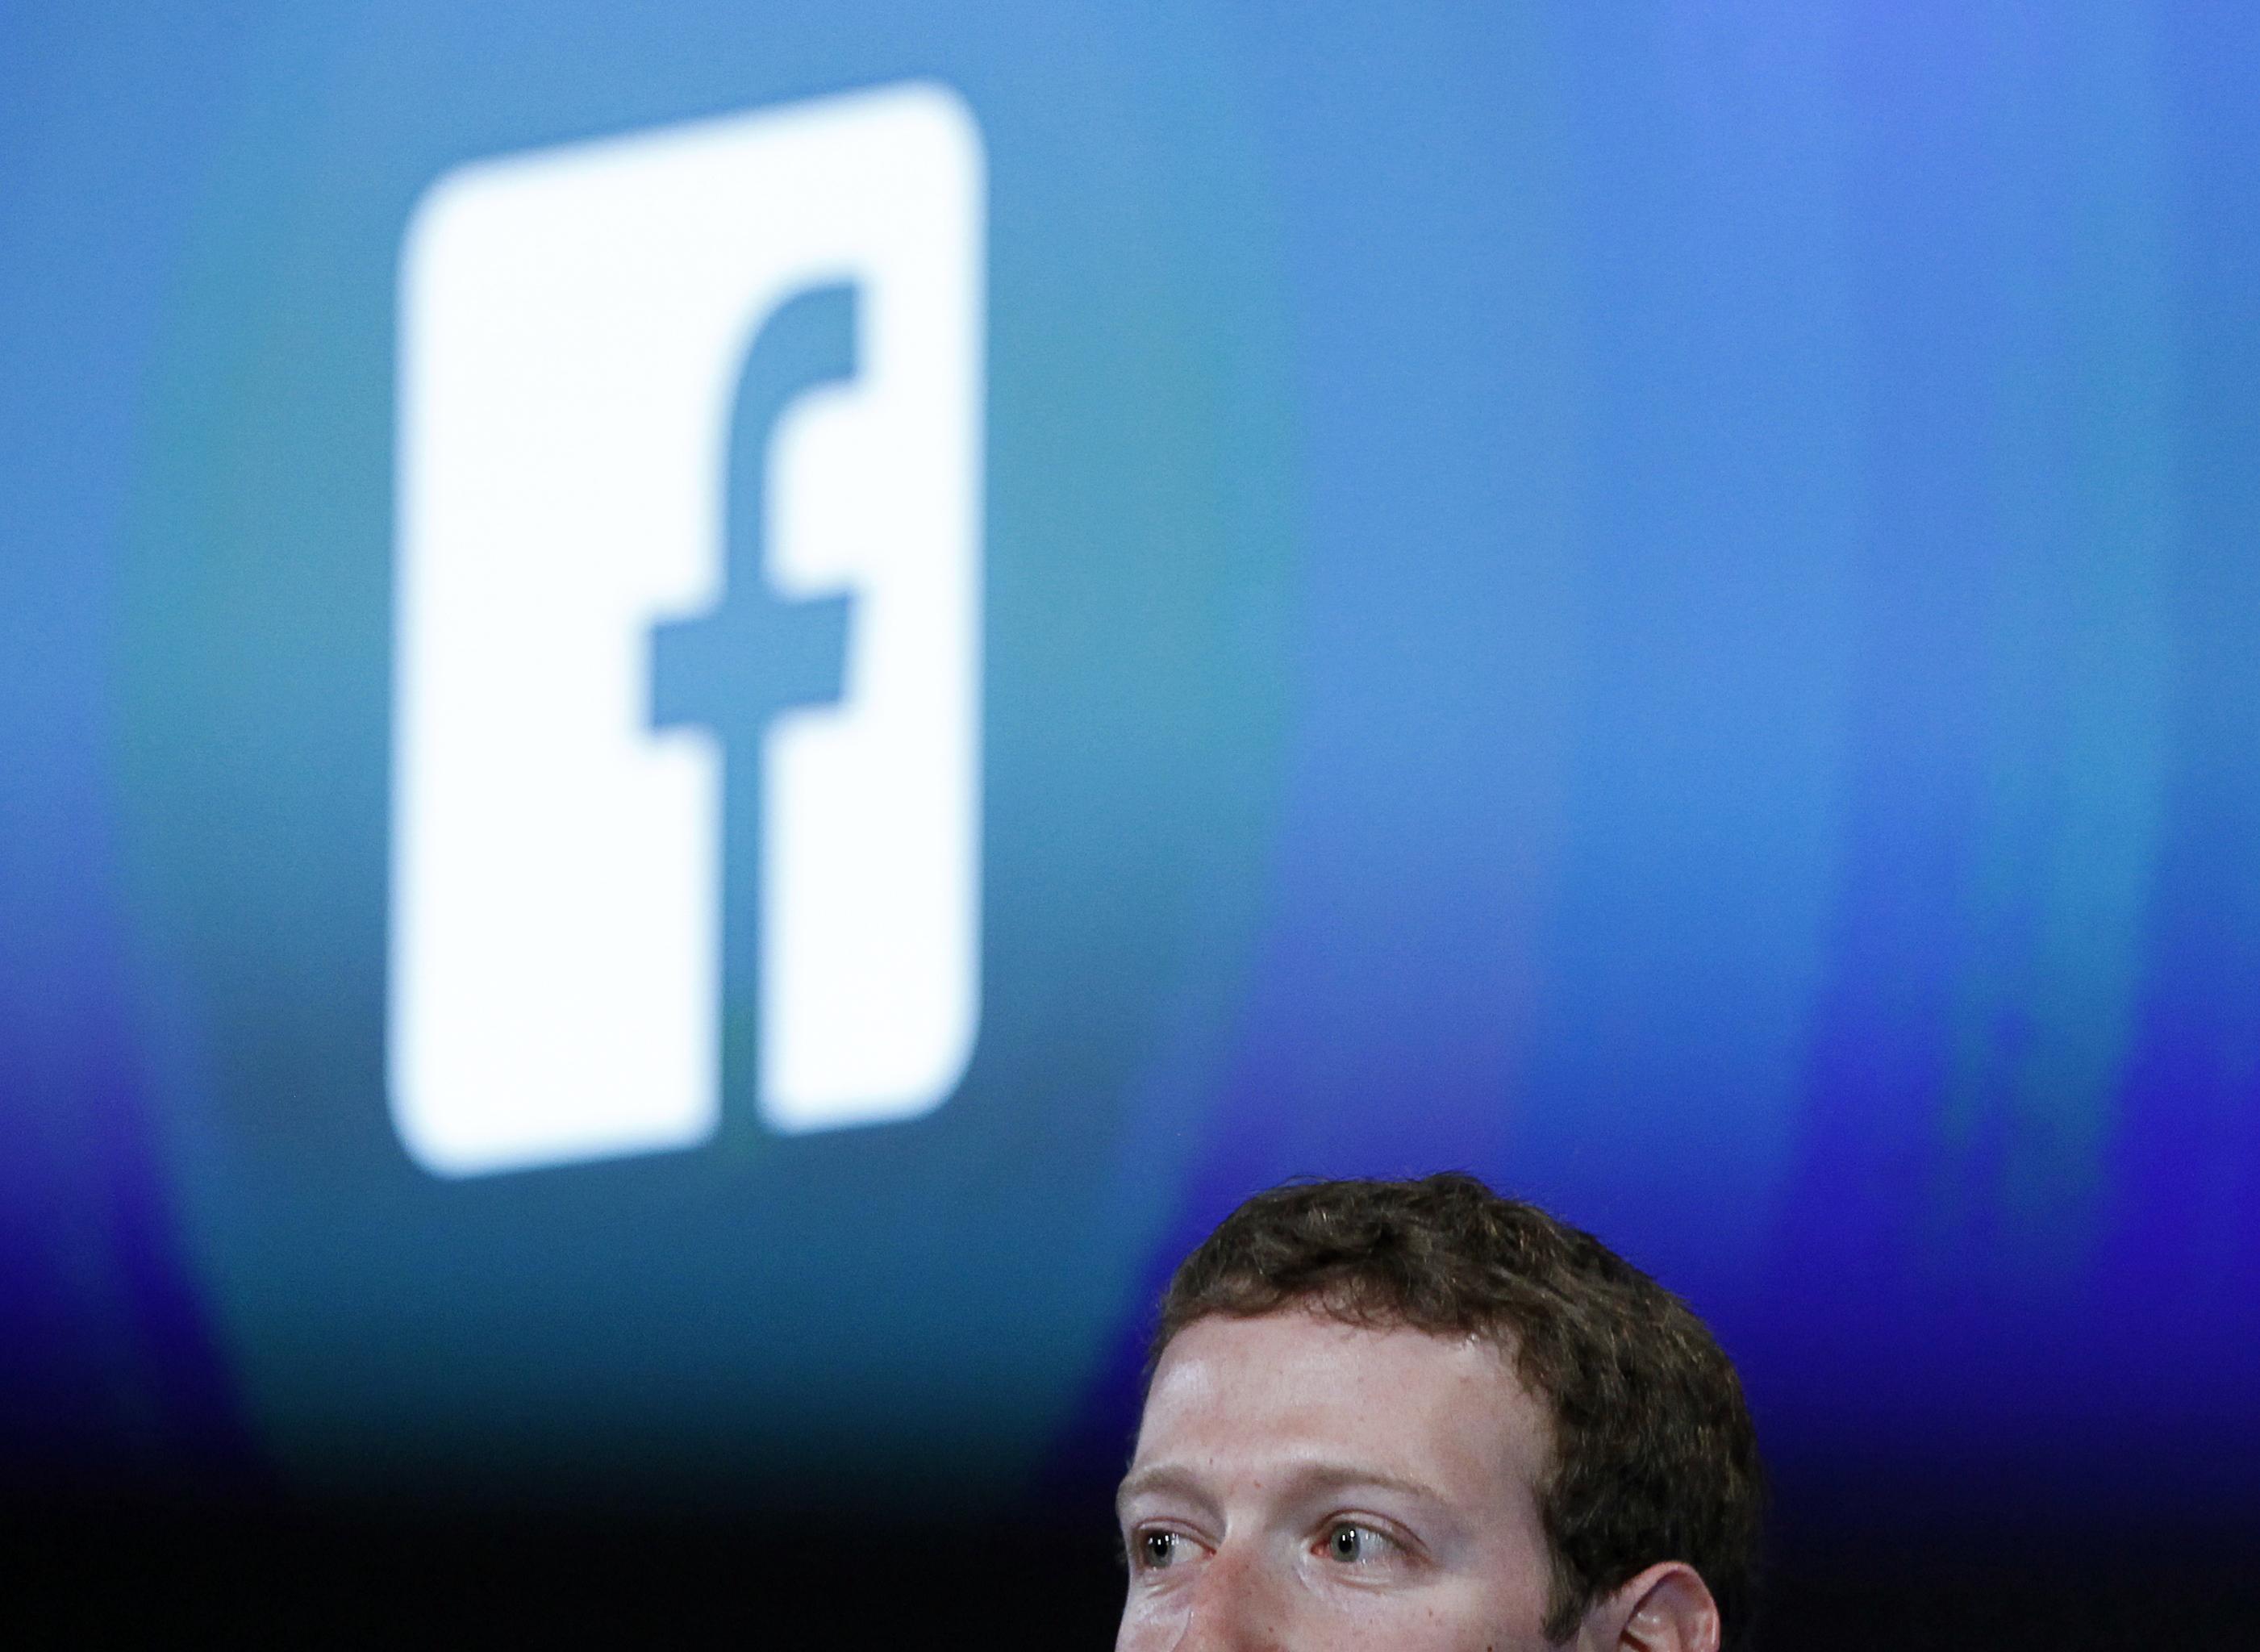 Mark Zuckerberg stands in front of the Facebook logo.